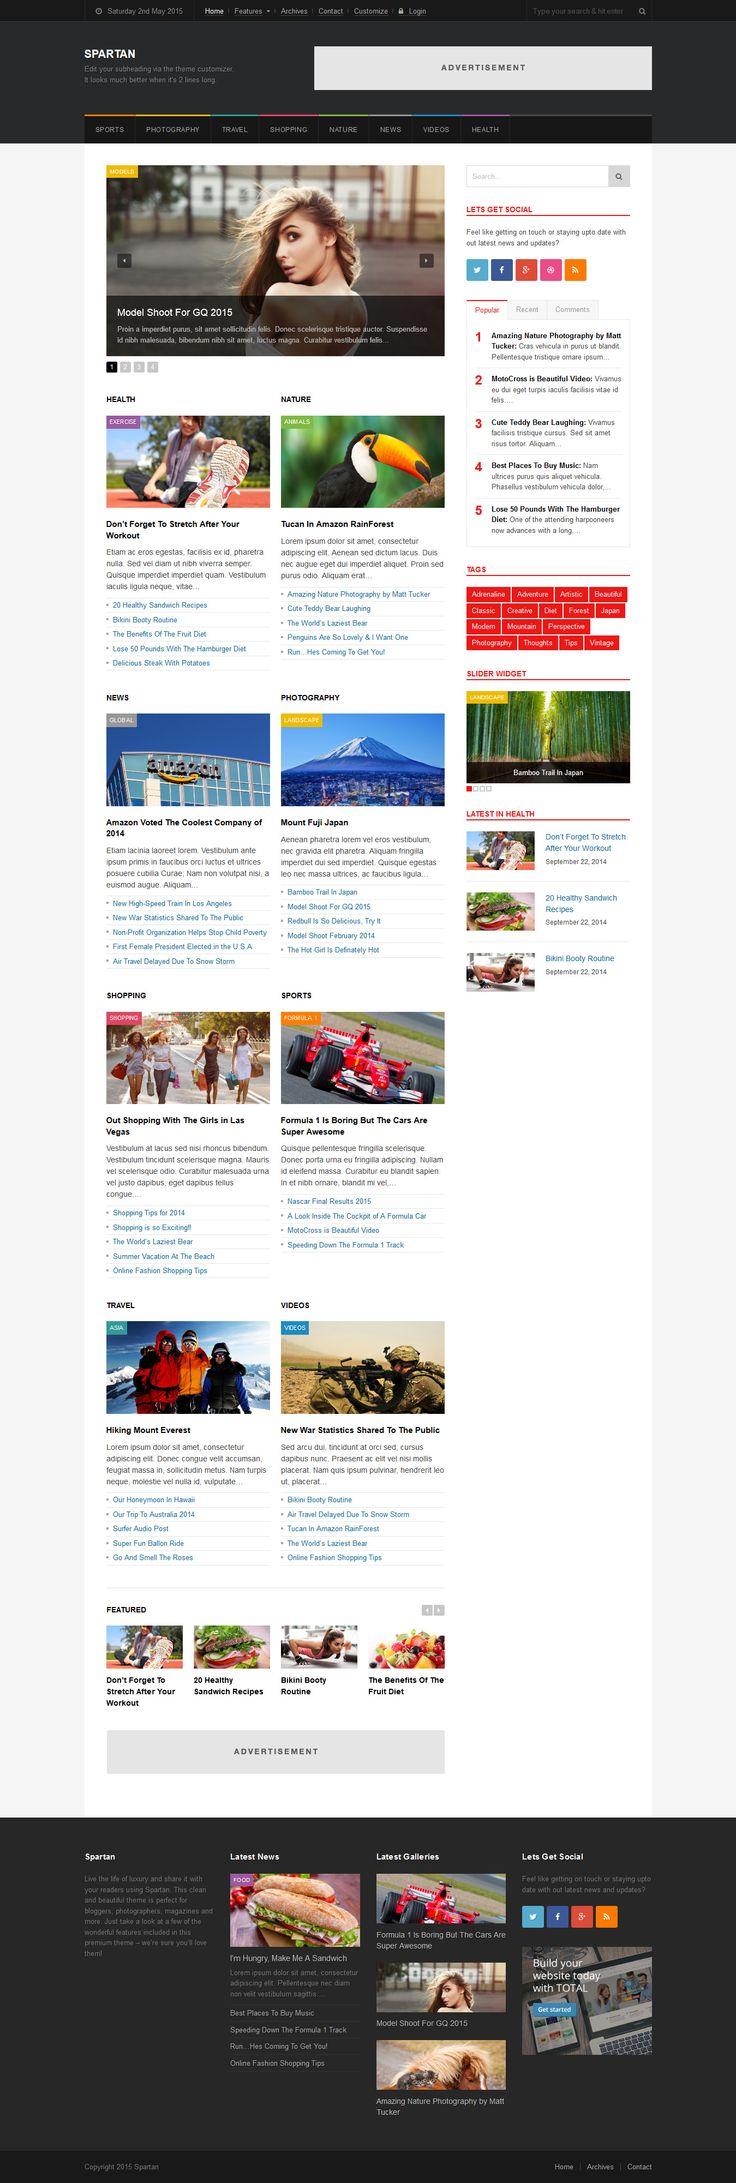 Spartan - News, Blog, Magazine WordPress Theme #blogtheme #wordpress #wpblog Live Preview and Download: http://themeforest.net/item/spartan-news-blog-magazine-wordpress-theme/8989923?ref=ksioks